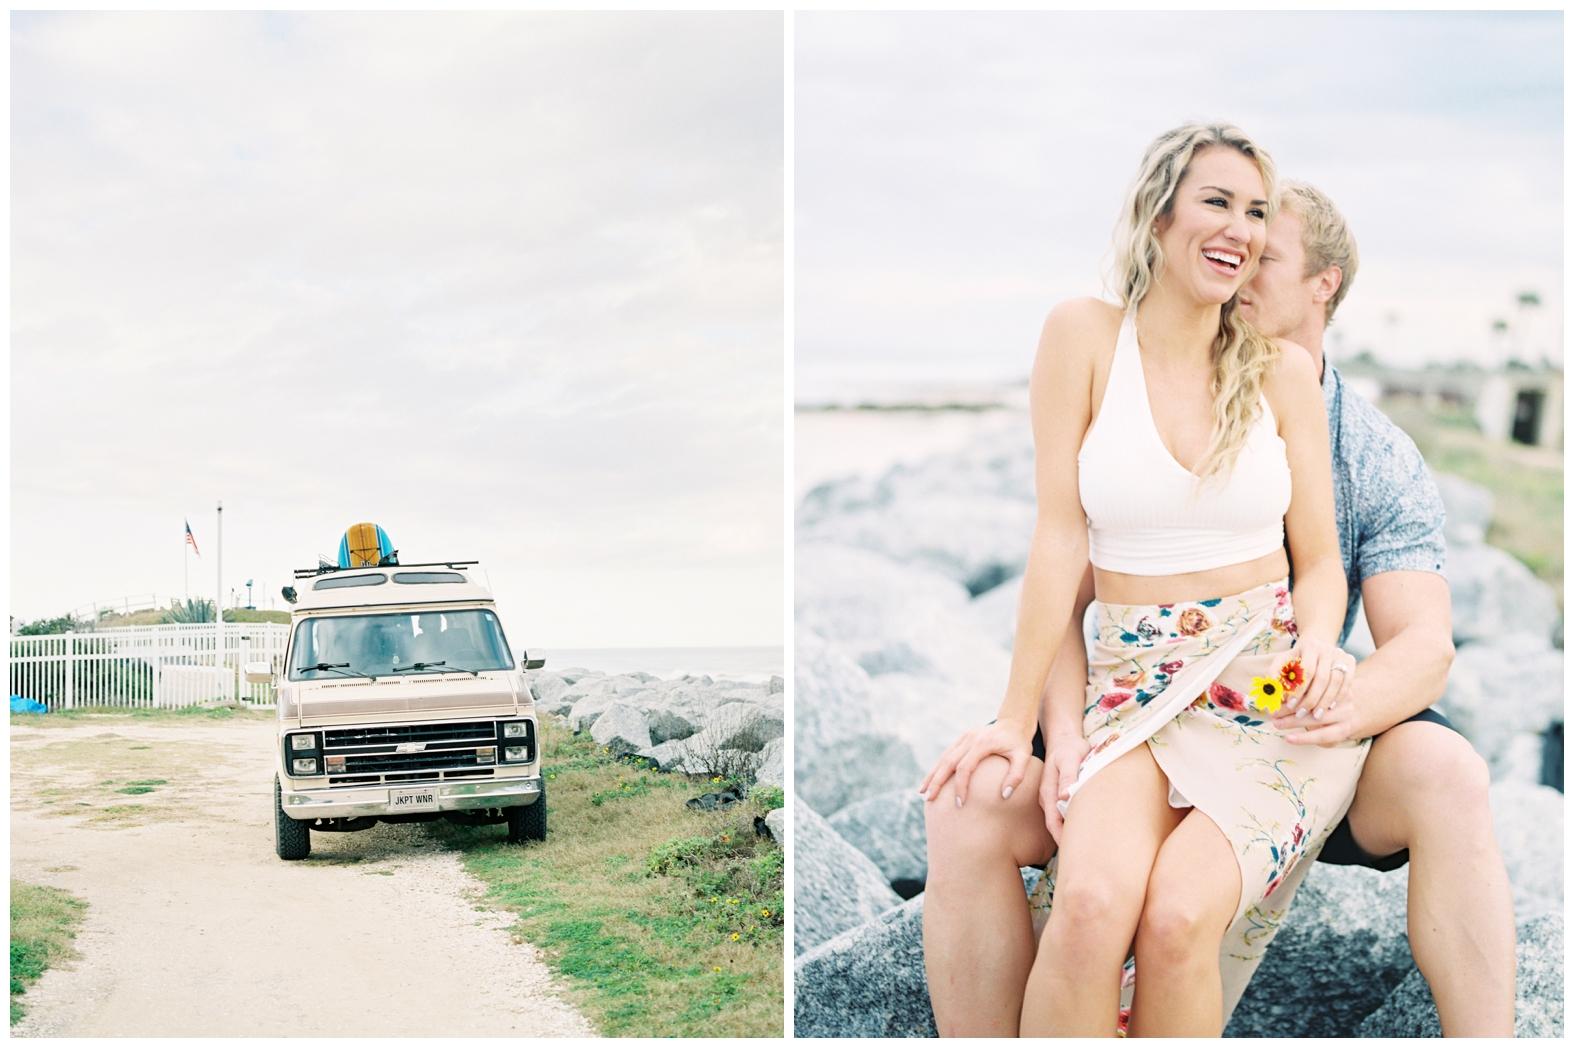 Lisa Silva Photography -Beachy Lifestyle Engagement Session in Palm Coast Florida - Jacksonville Film Photograpgers_0013.jpg